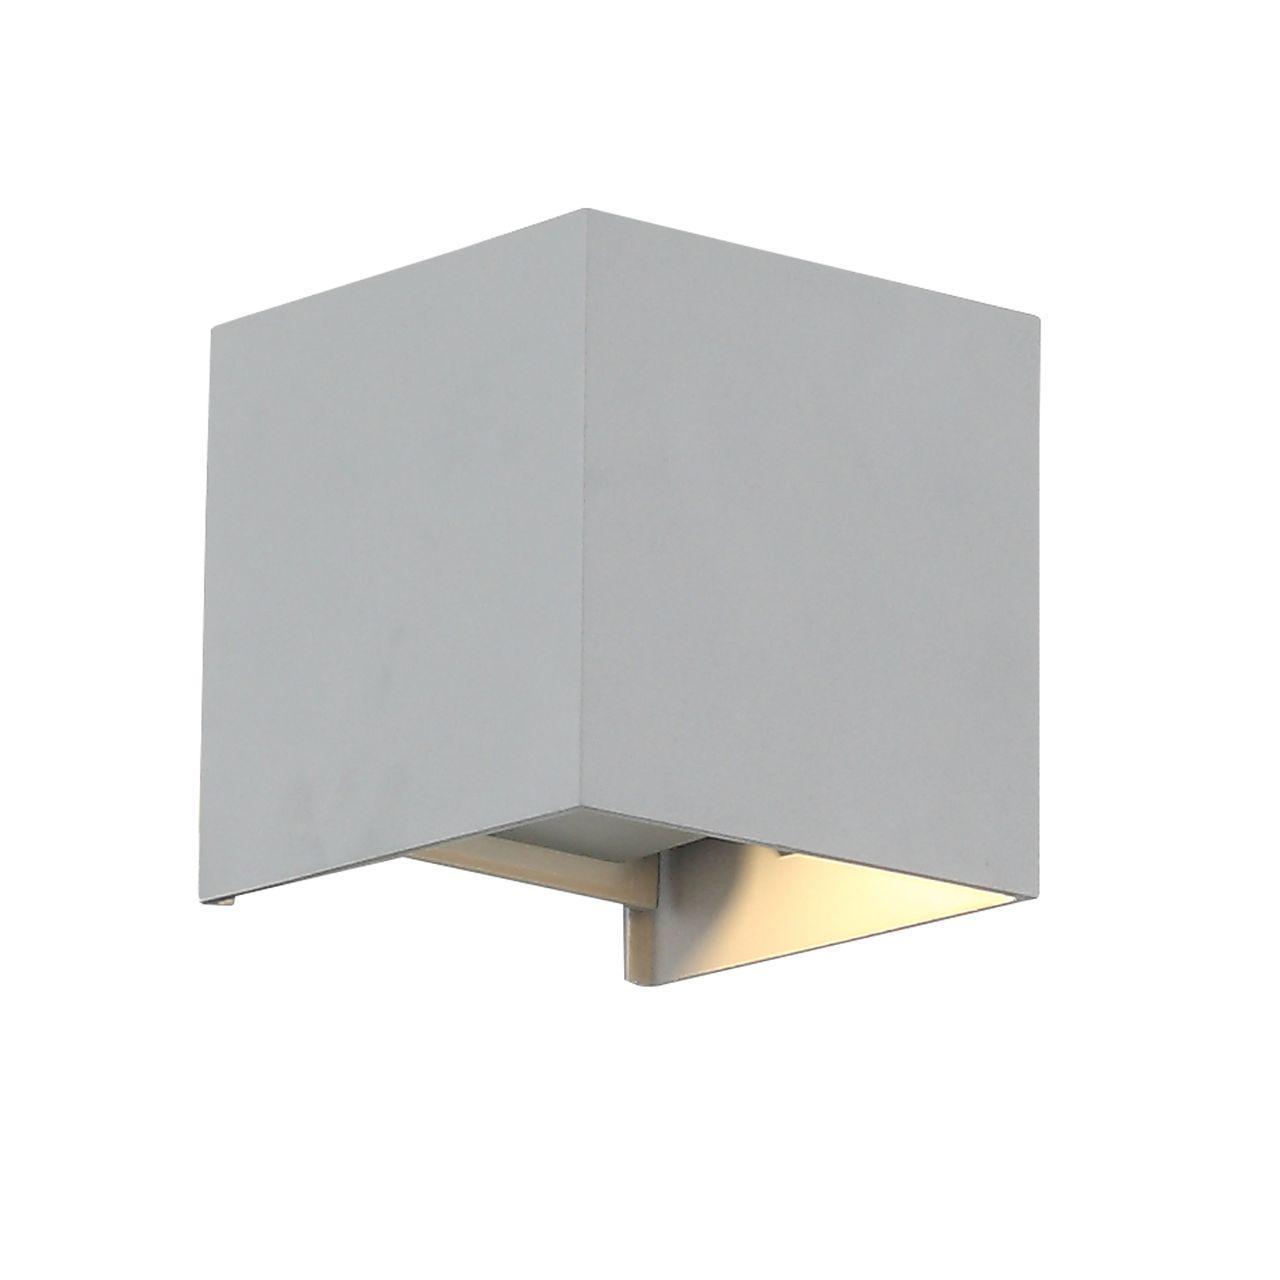 Уличный настенный светодиодный светильник ST Luce Staffa SL560.701.02 foppapedretti base auto con staffa 9700372300